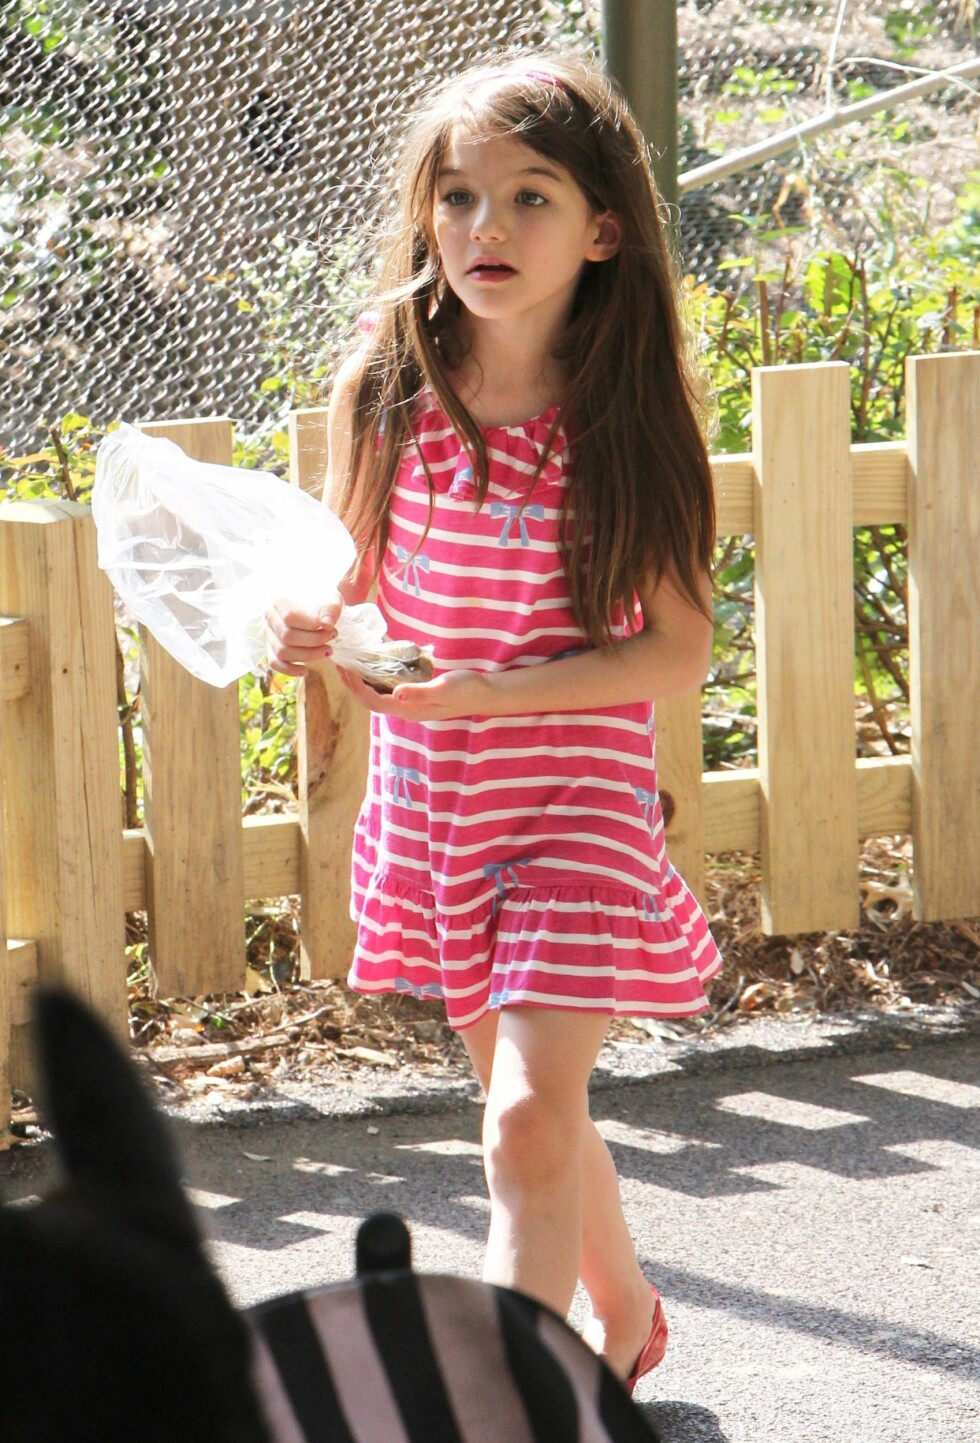 Lille Suri i stripete, rosa kjole og løst hår. Foto: All Over Press